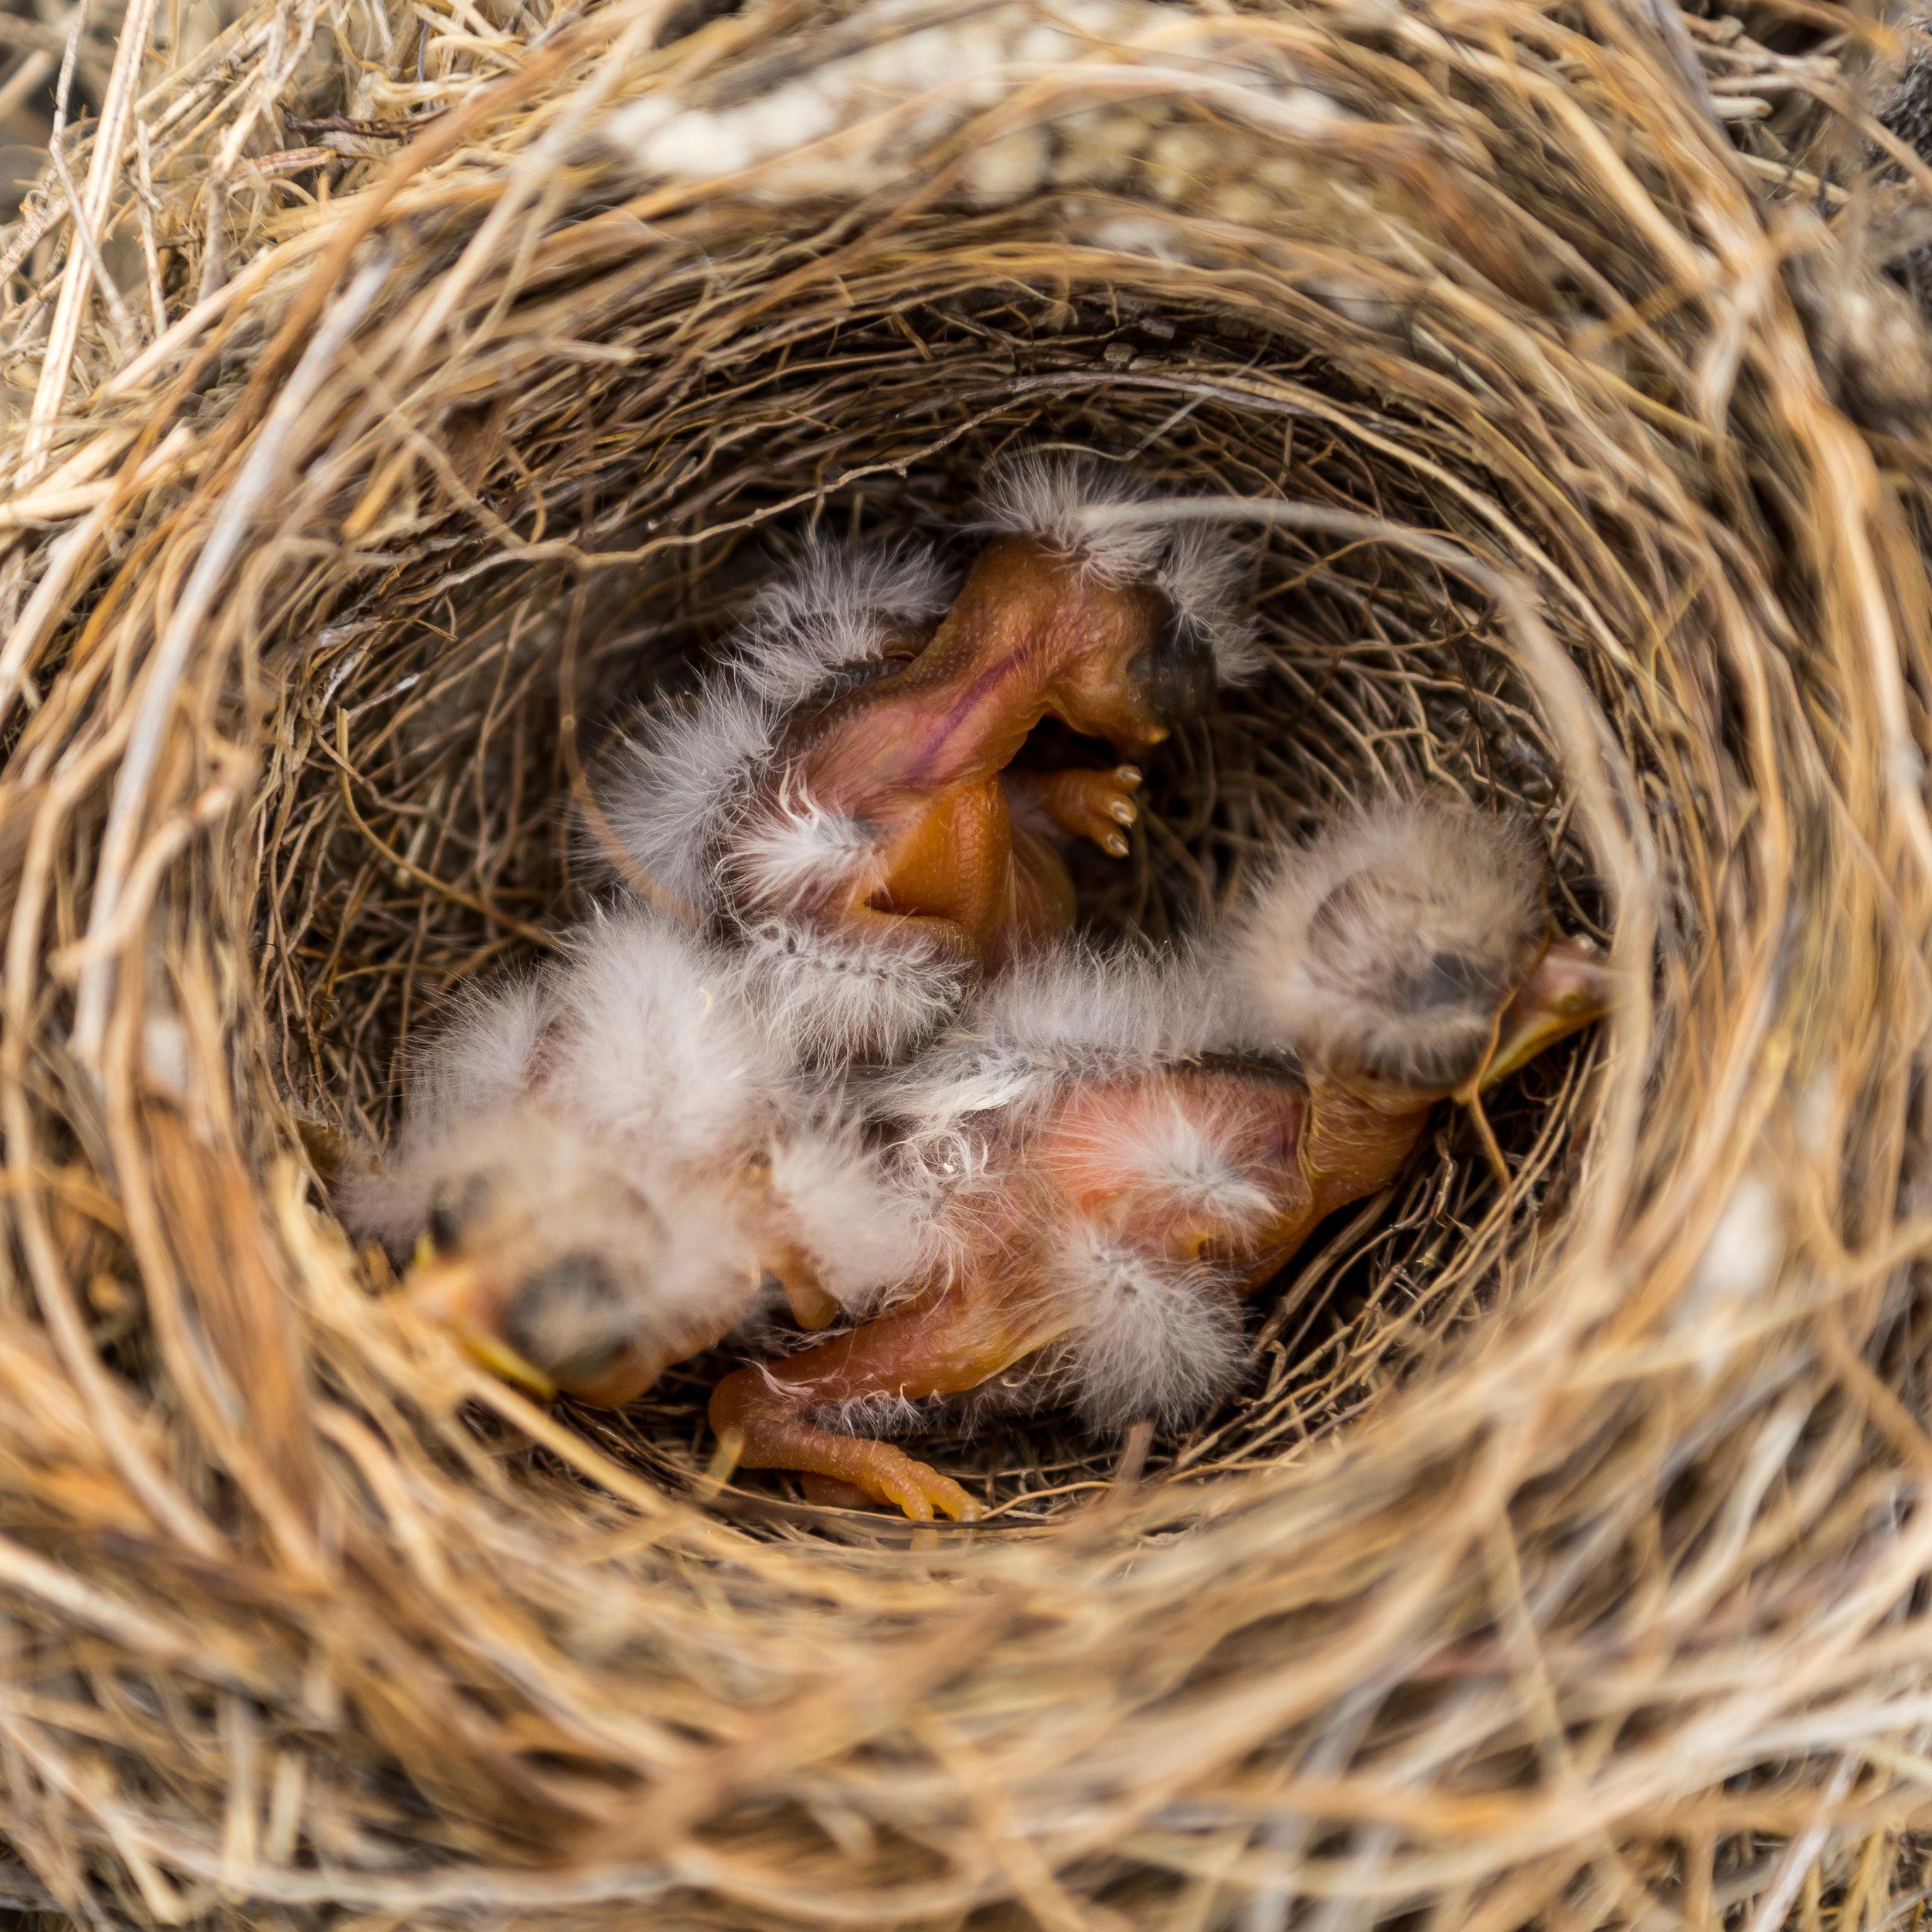 Hatchlings, Upper Missouri River Breaks, MT